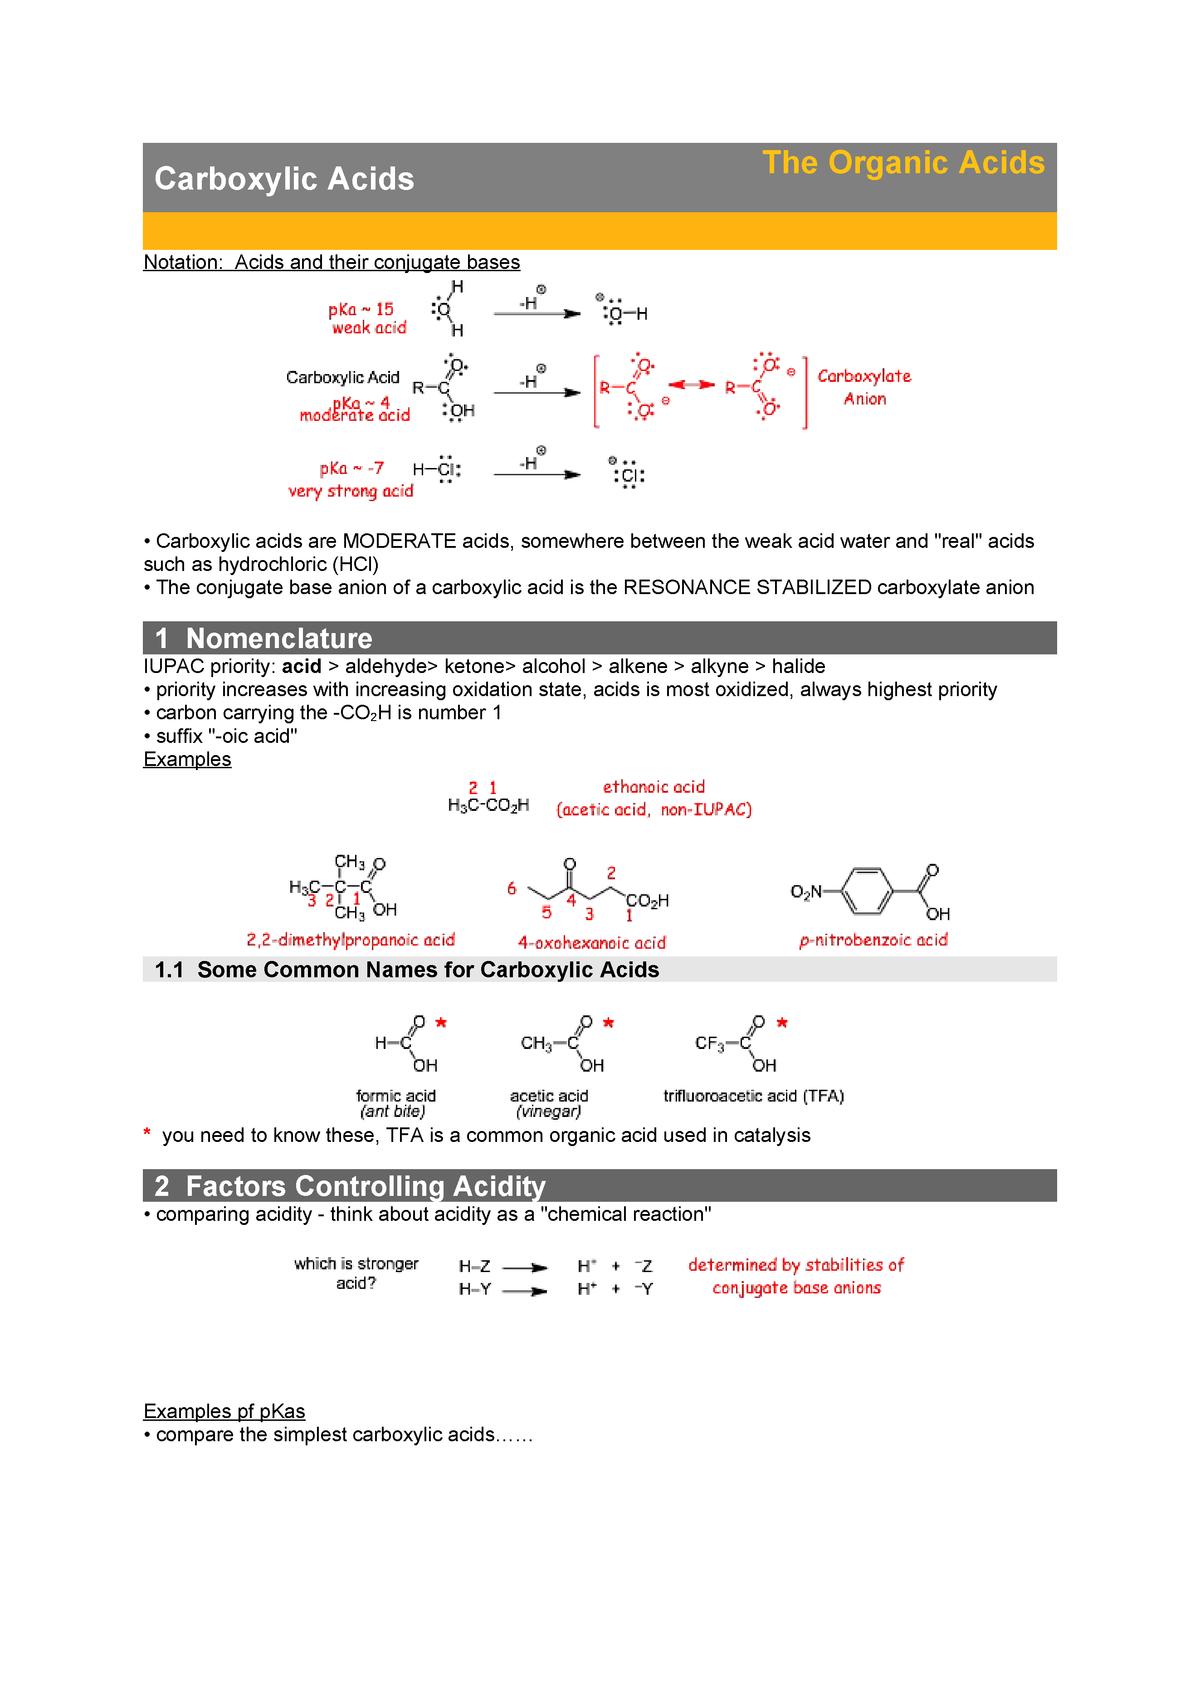 Carboxylic Acids The Organic Acids Chm 234 Asu Studocu